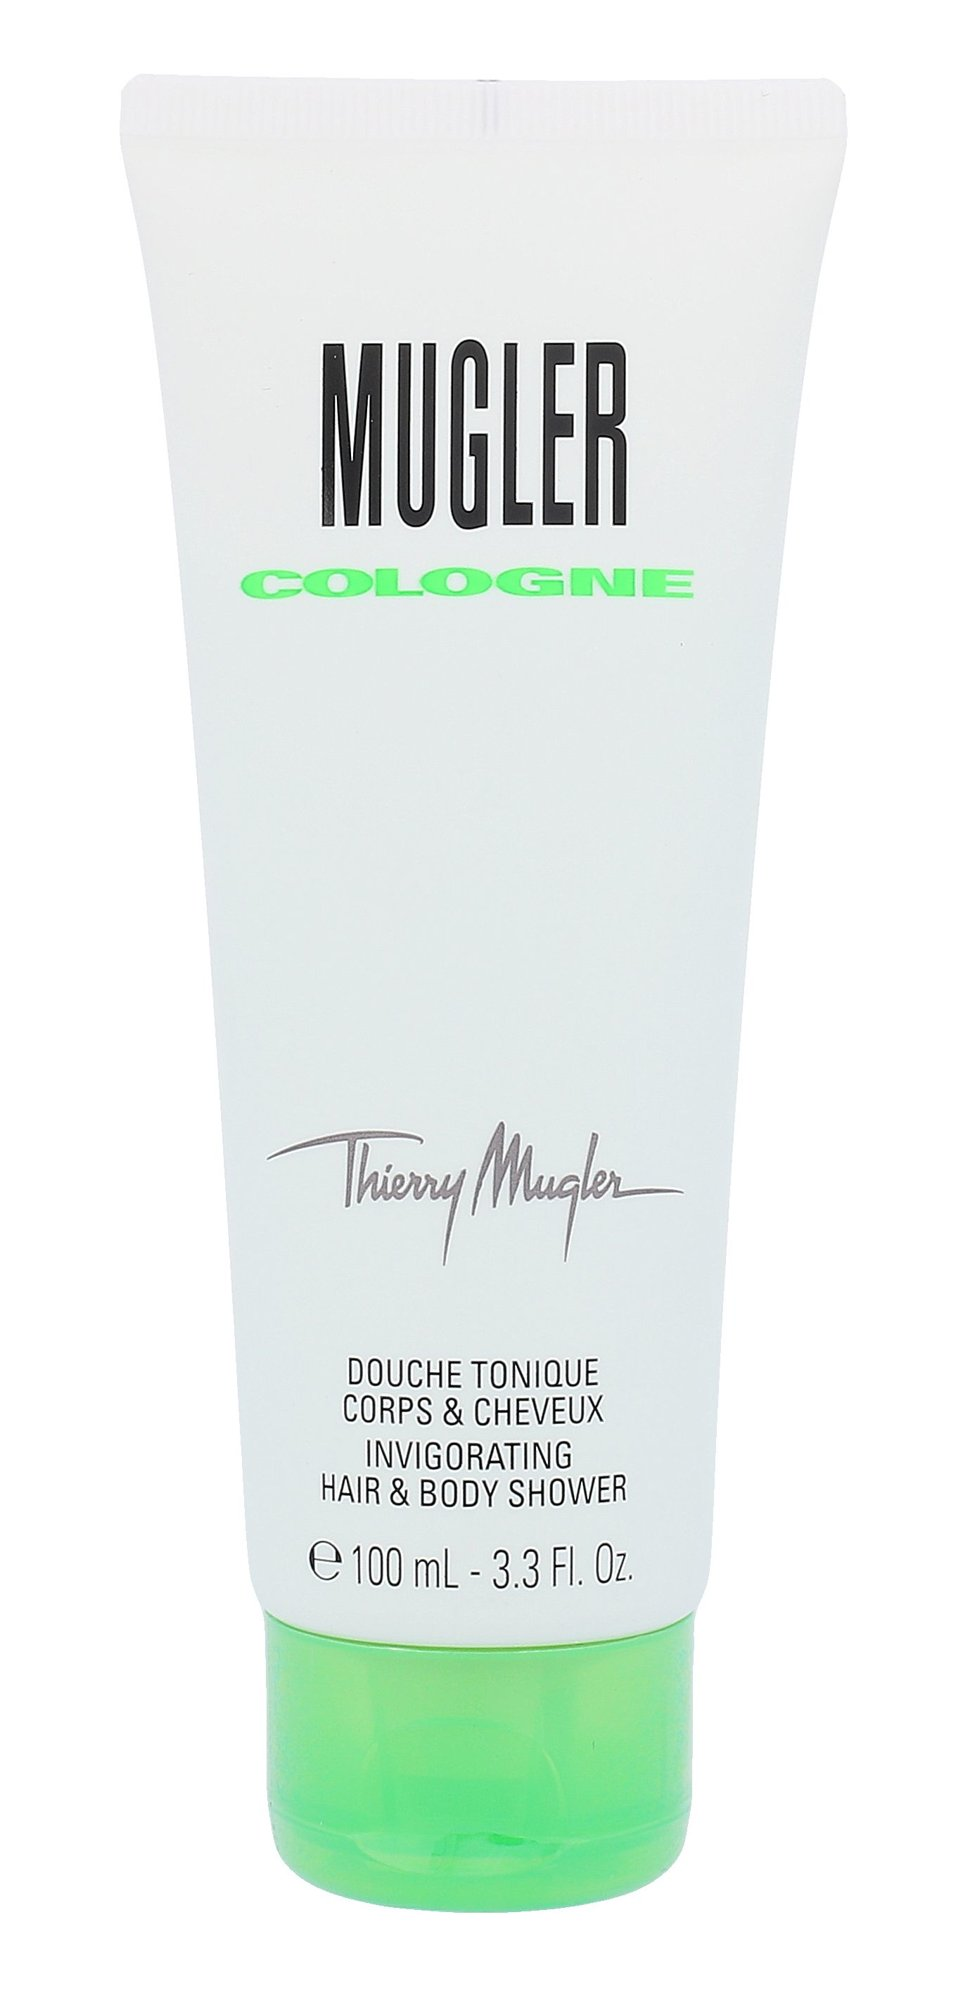 Thierry Mugler Mugler Cologne Shower gel 100ml